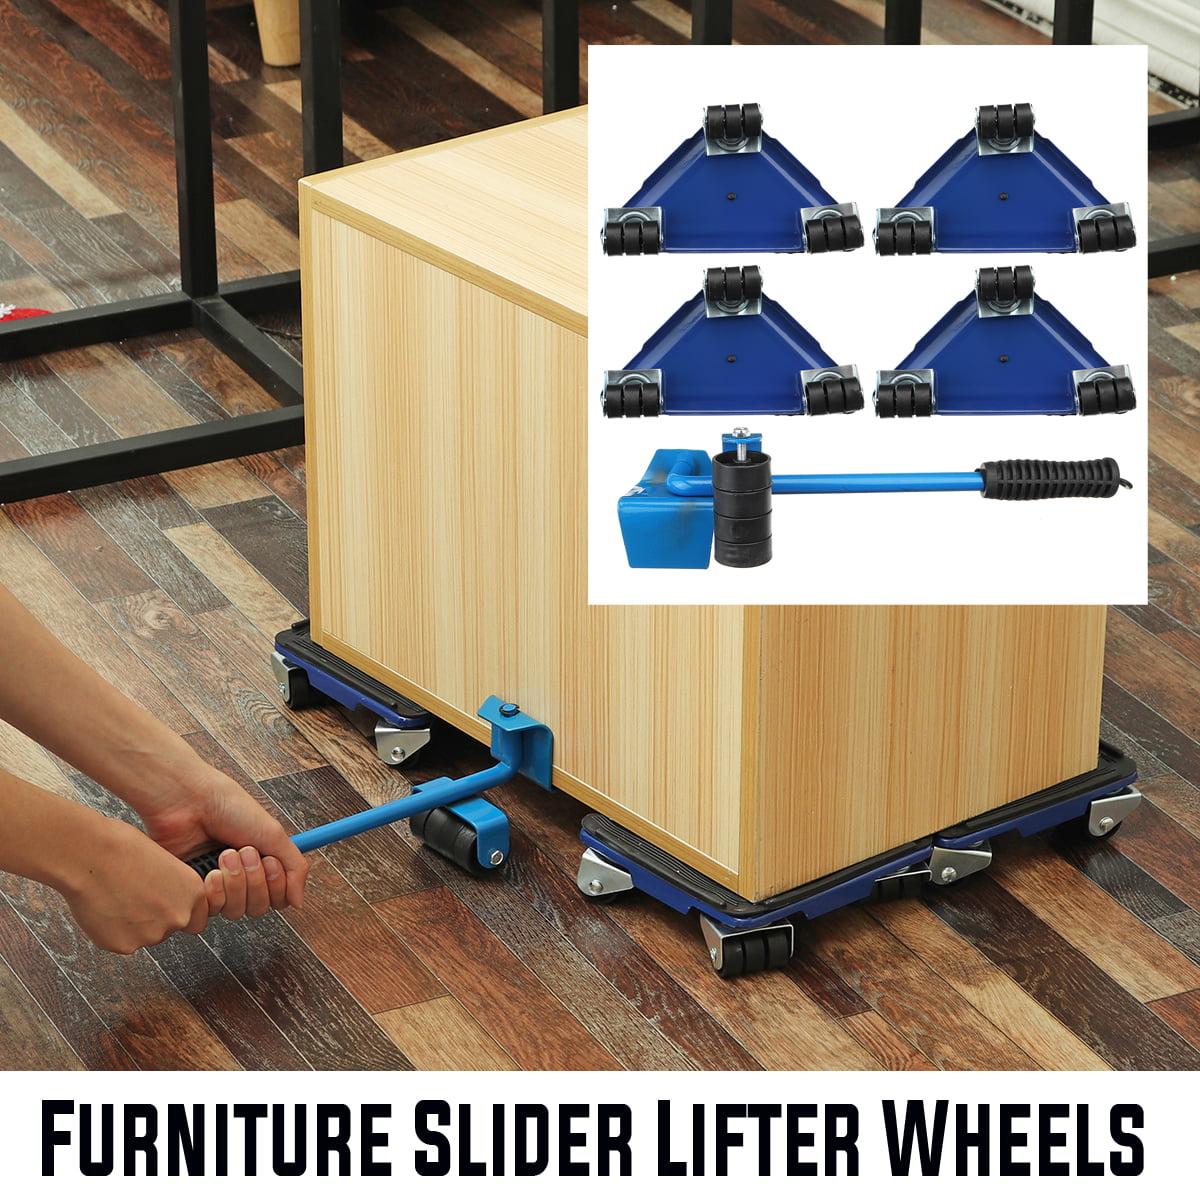 CHIFAN Easy Move Furniture Transport Set 360 Degree Rotatable Furniture Slides 250Kg Capacity